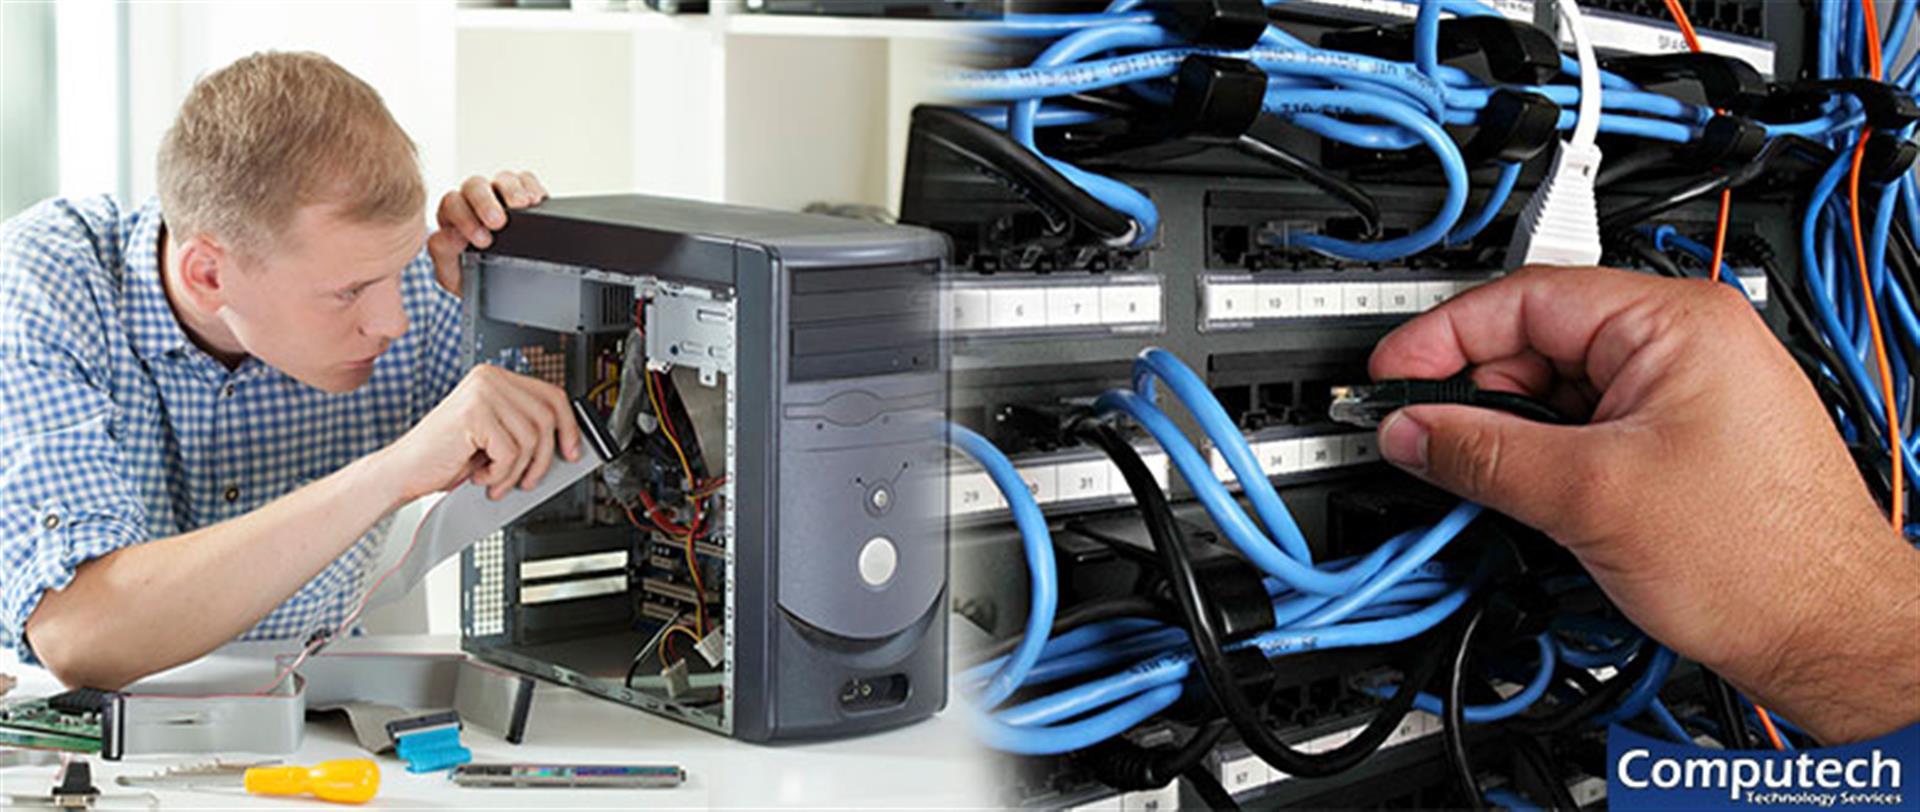 Ringgold Georgia Onsite Computer PC & Printer Repair, Networks, Voice & Data Cabling Contractors